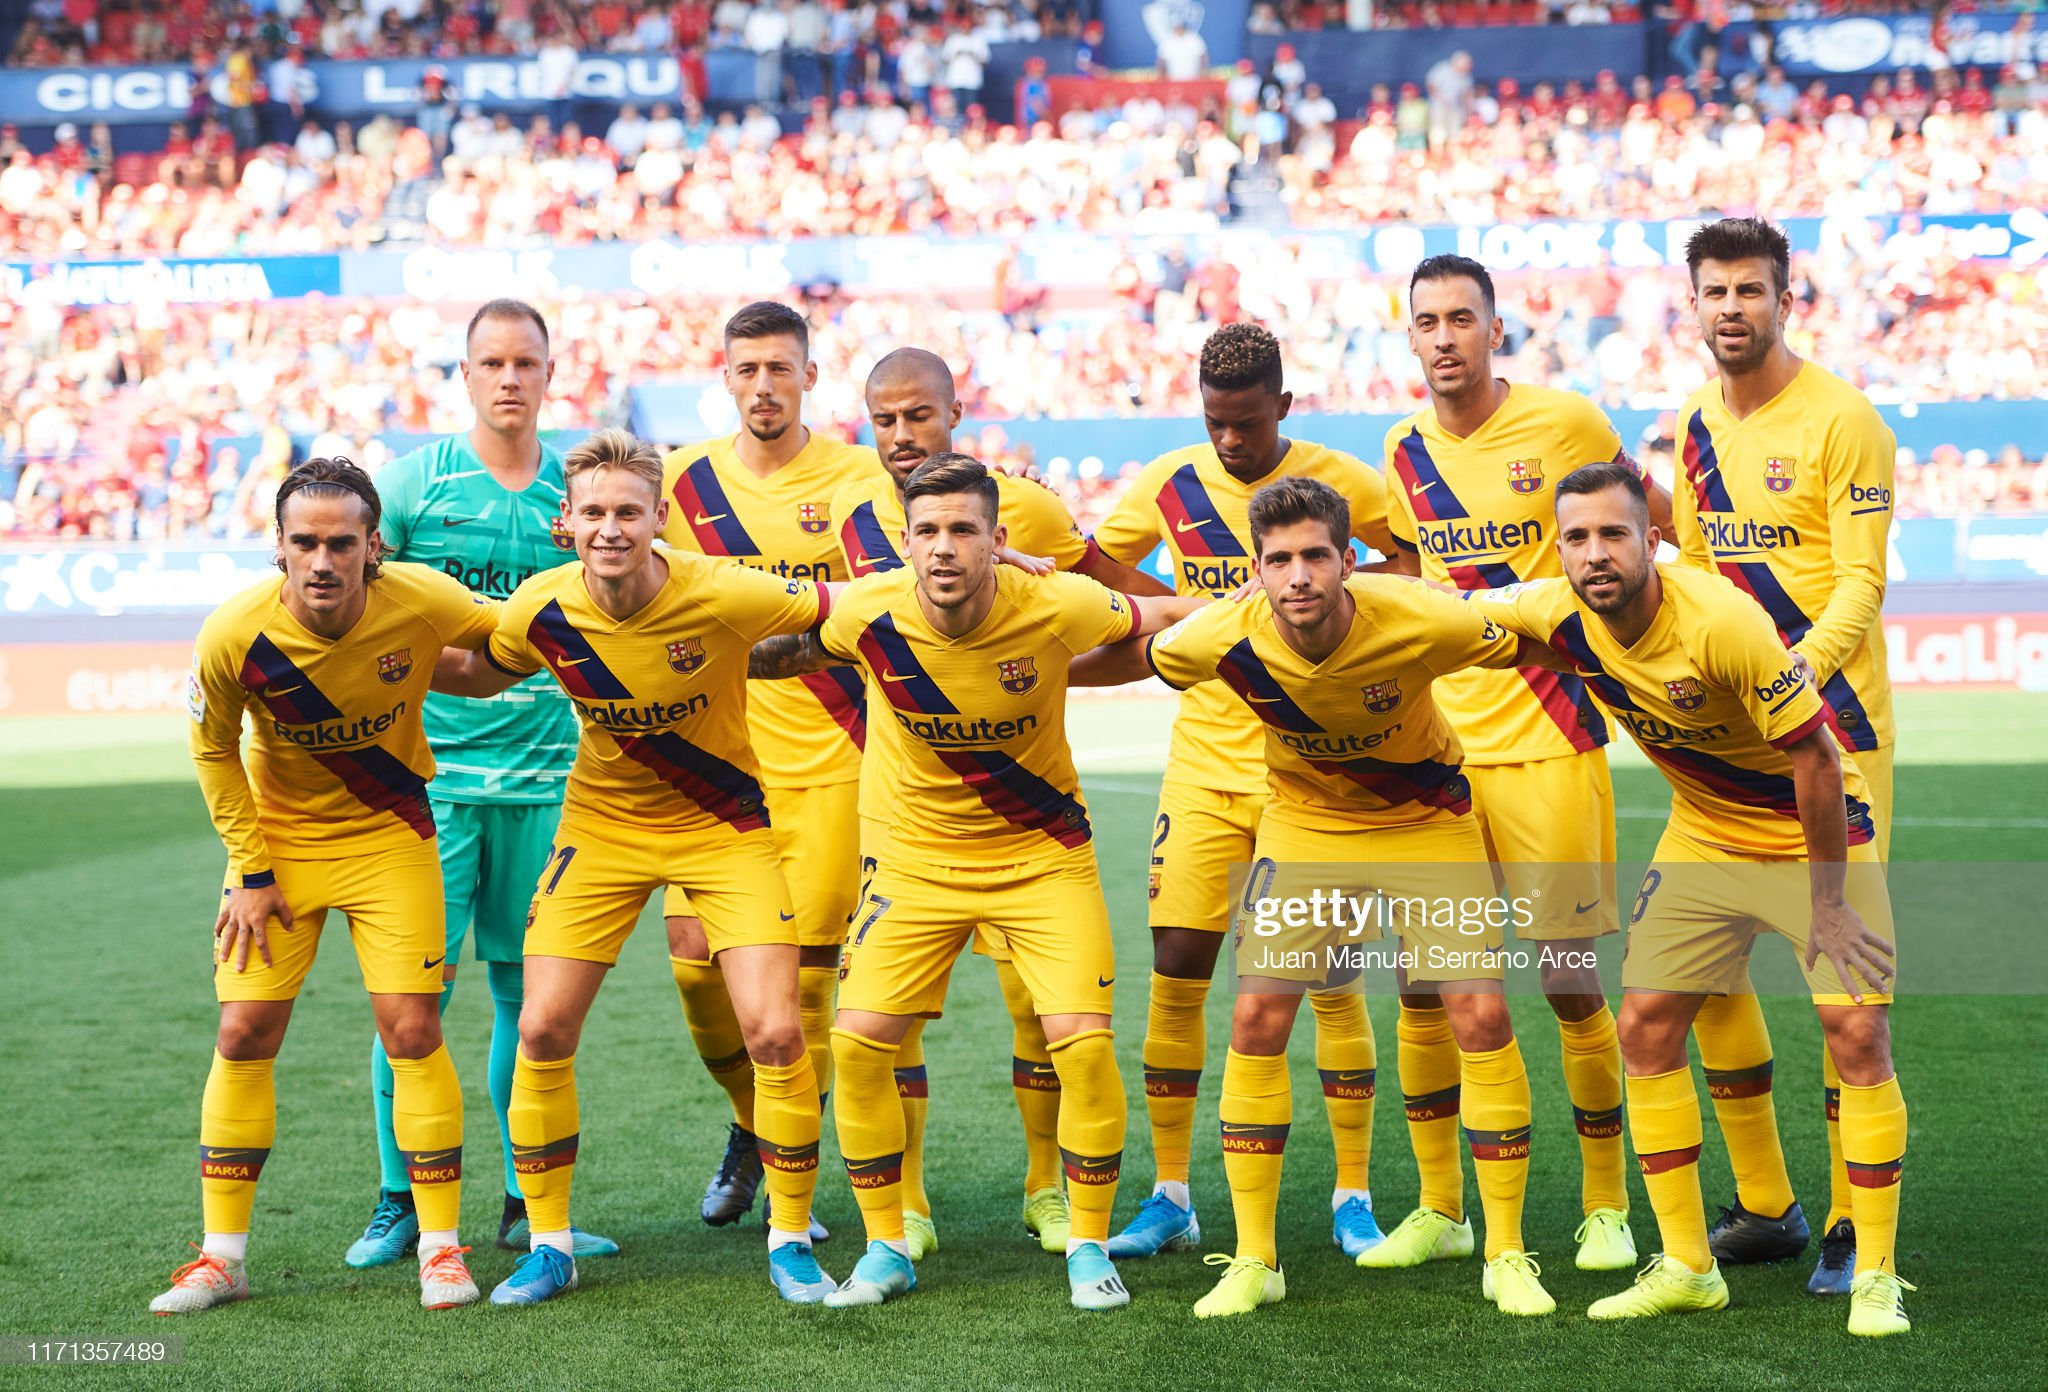 صور مباراة : أوساسونا - برشلونة 2-2 ( 31-08-2019 )  Barcelona-line-up-for-a-team-photo-prior-to-the-liga-match-between-ca-picture-id1171357489?s=2048x2048